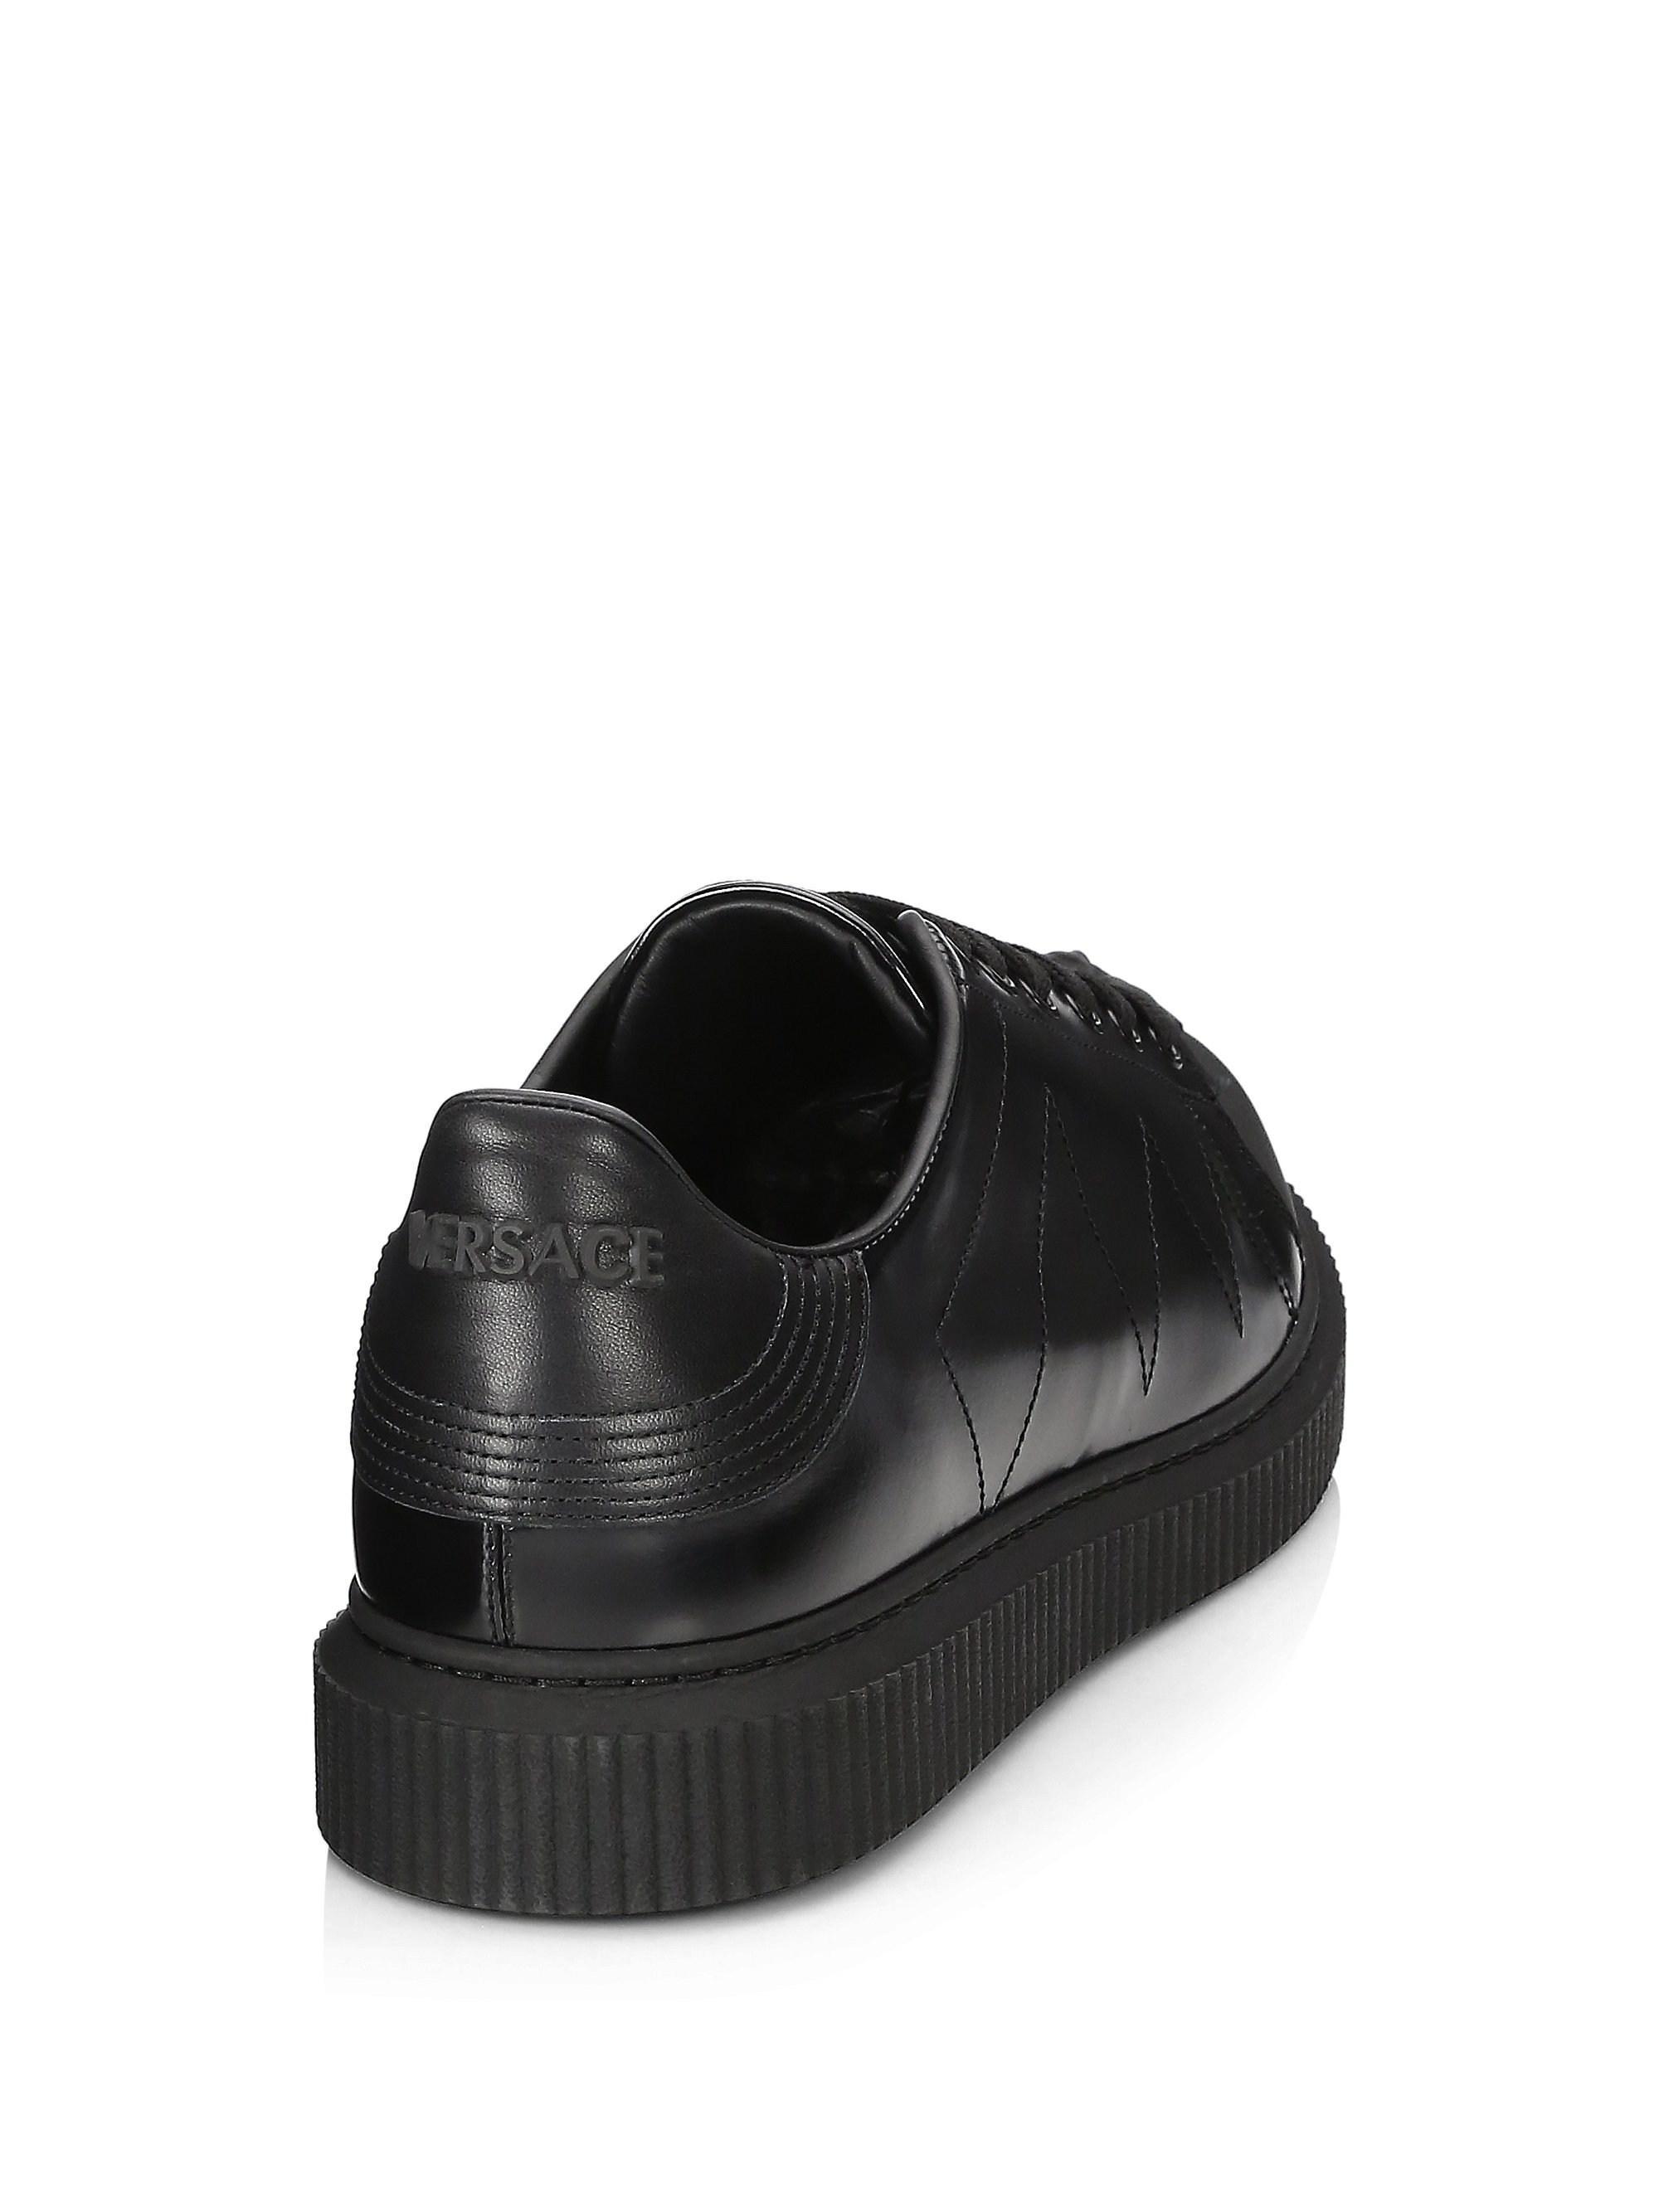 medusa leather nyx sneakers